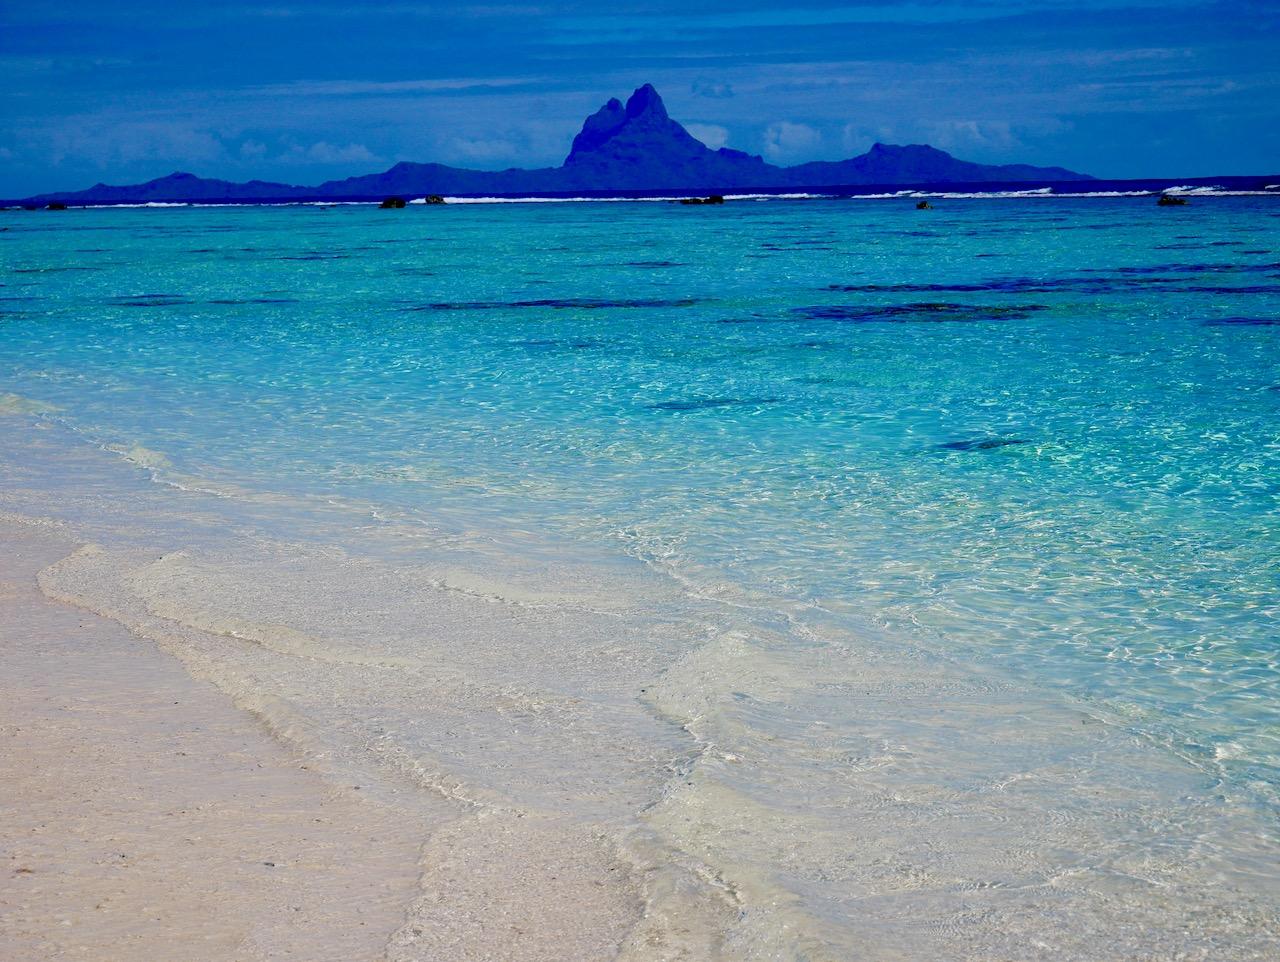 Au revoir, la Polynésie - Bula, Fiji!